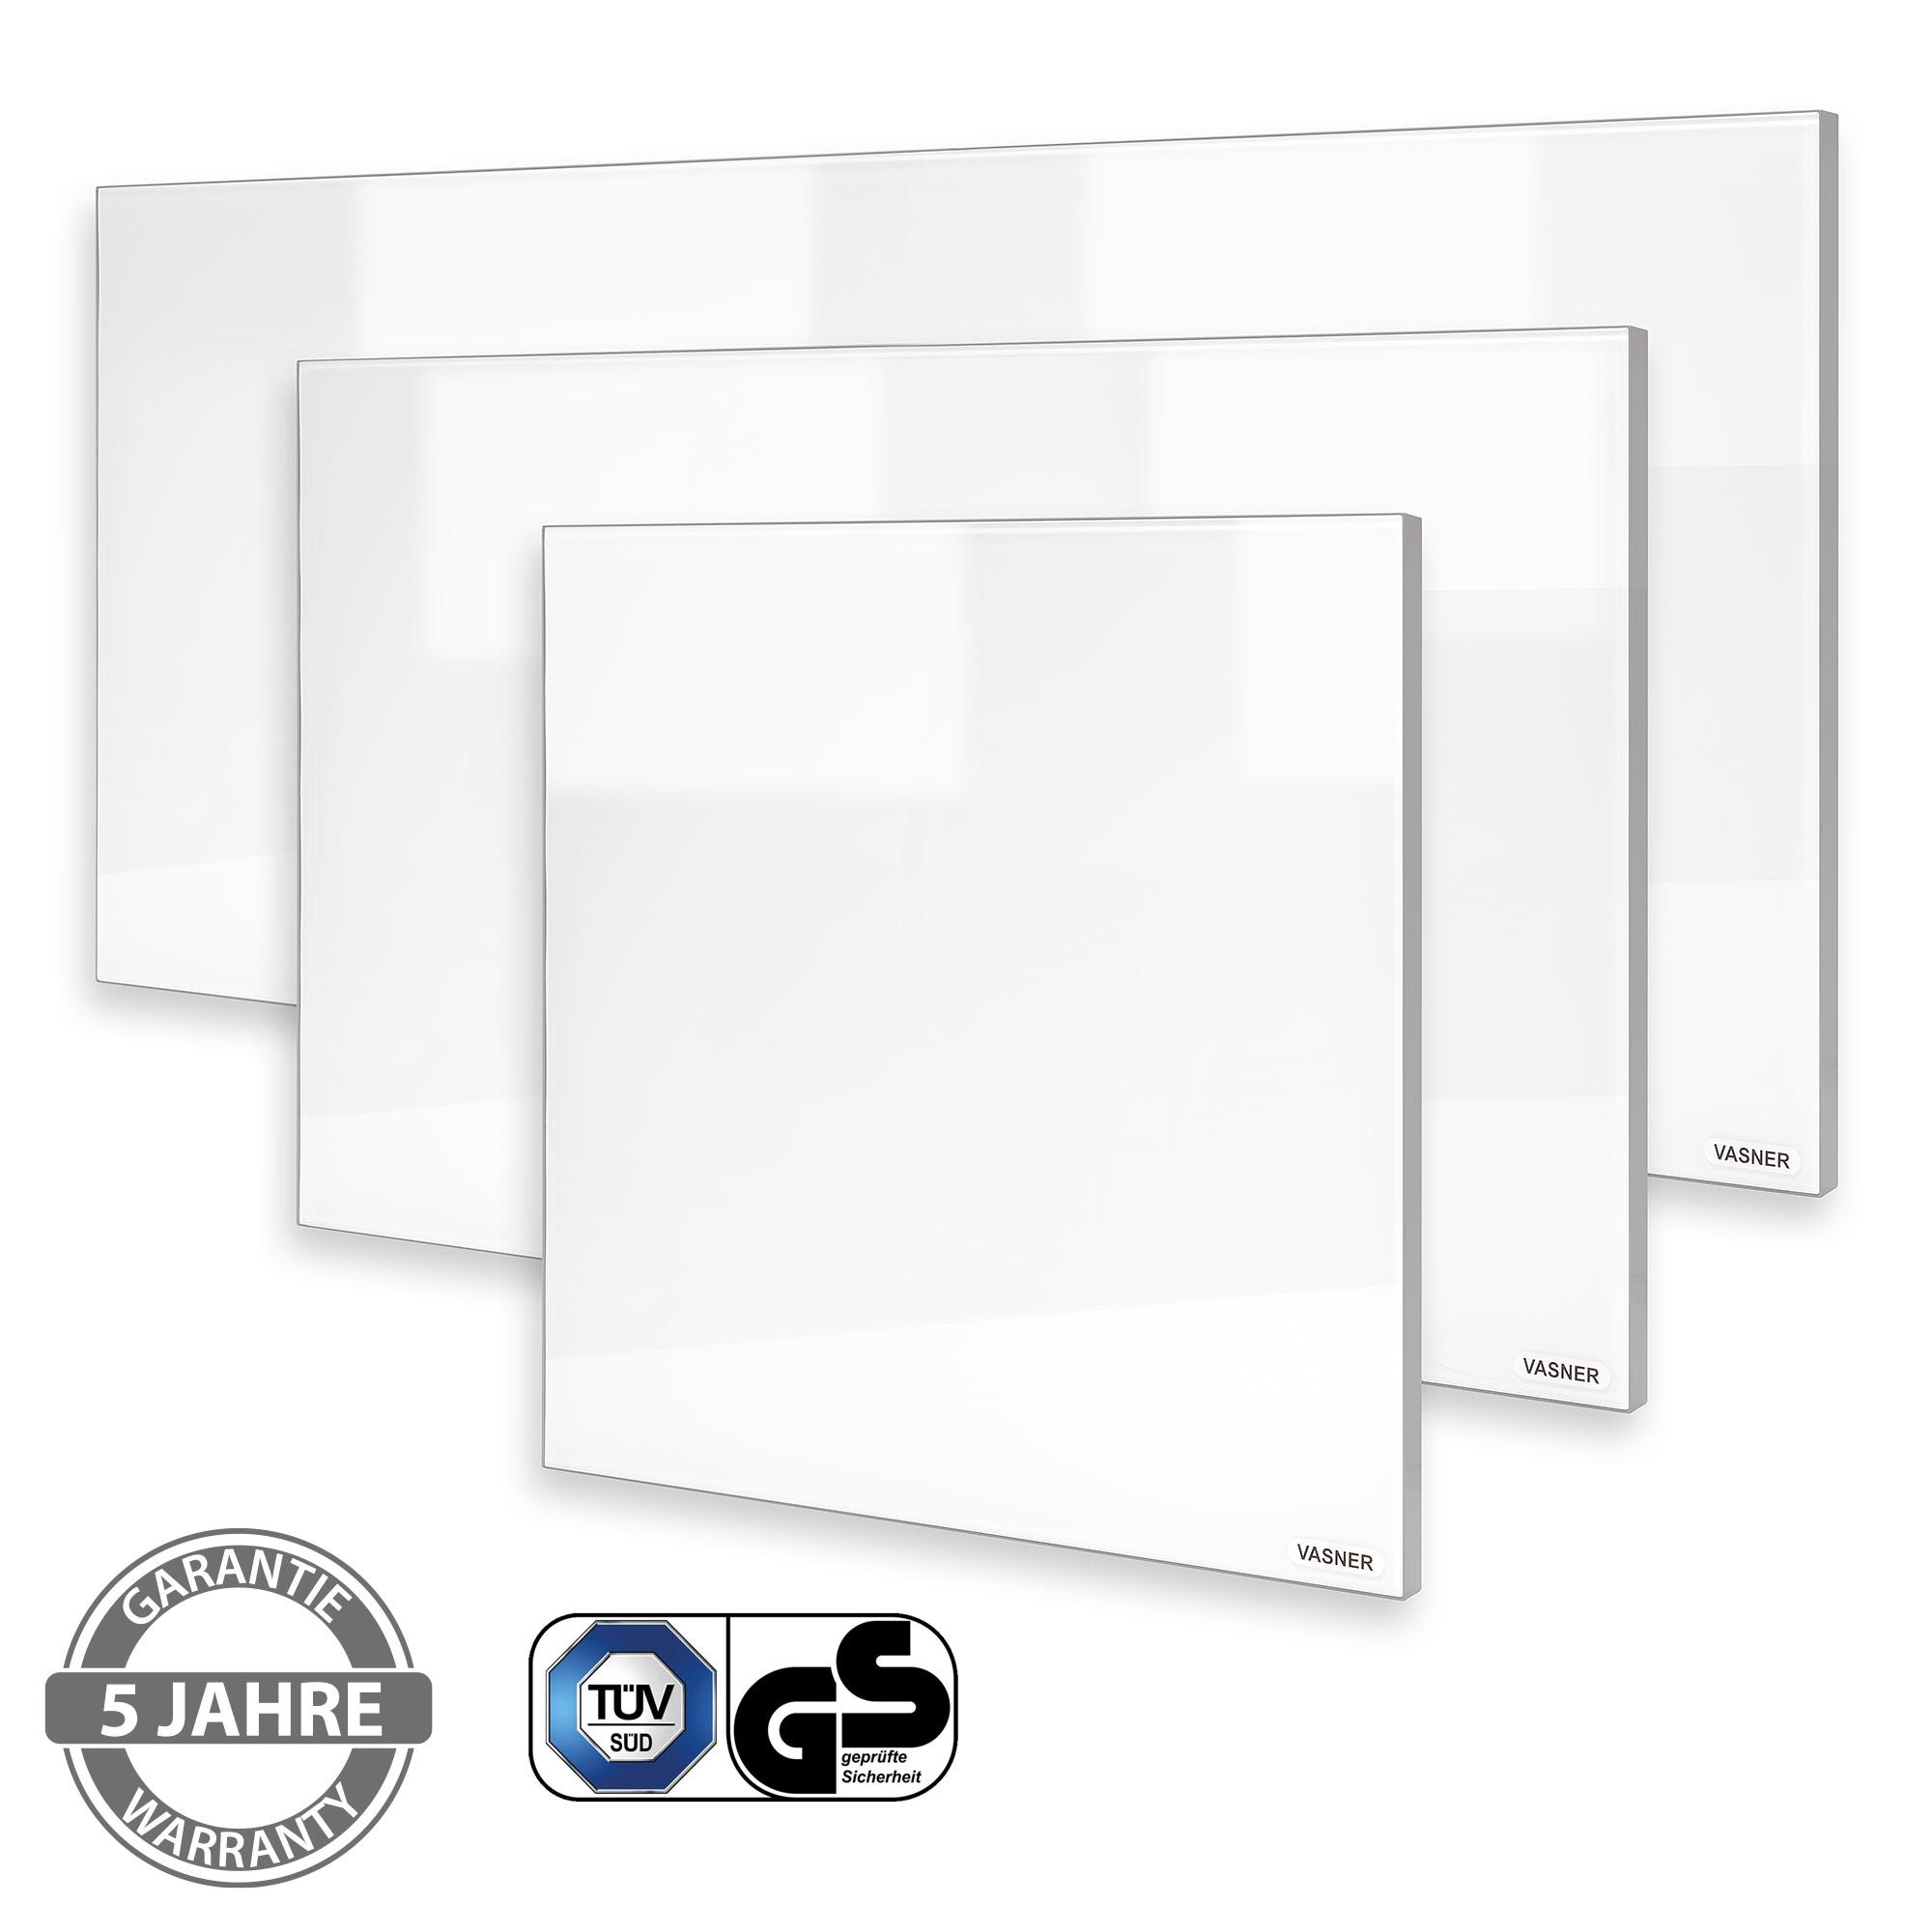 Infrarotheizung Glas 300 - 900 Watt